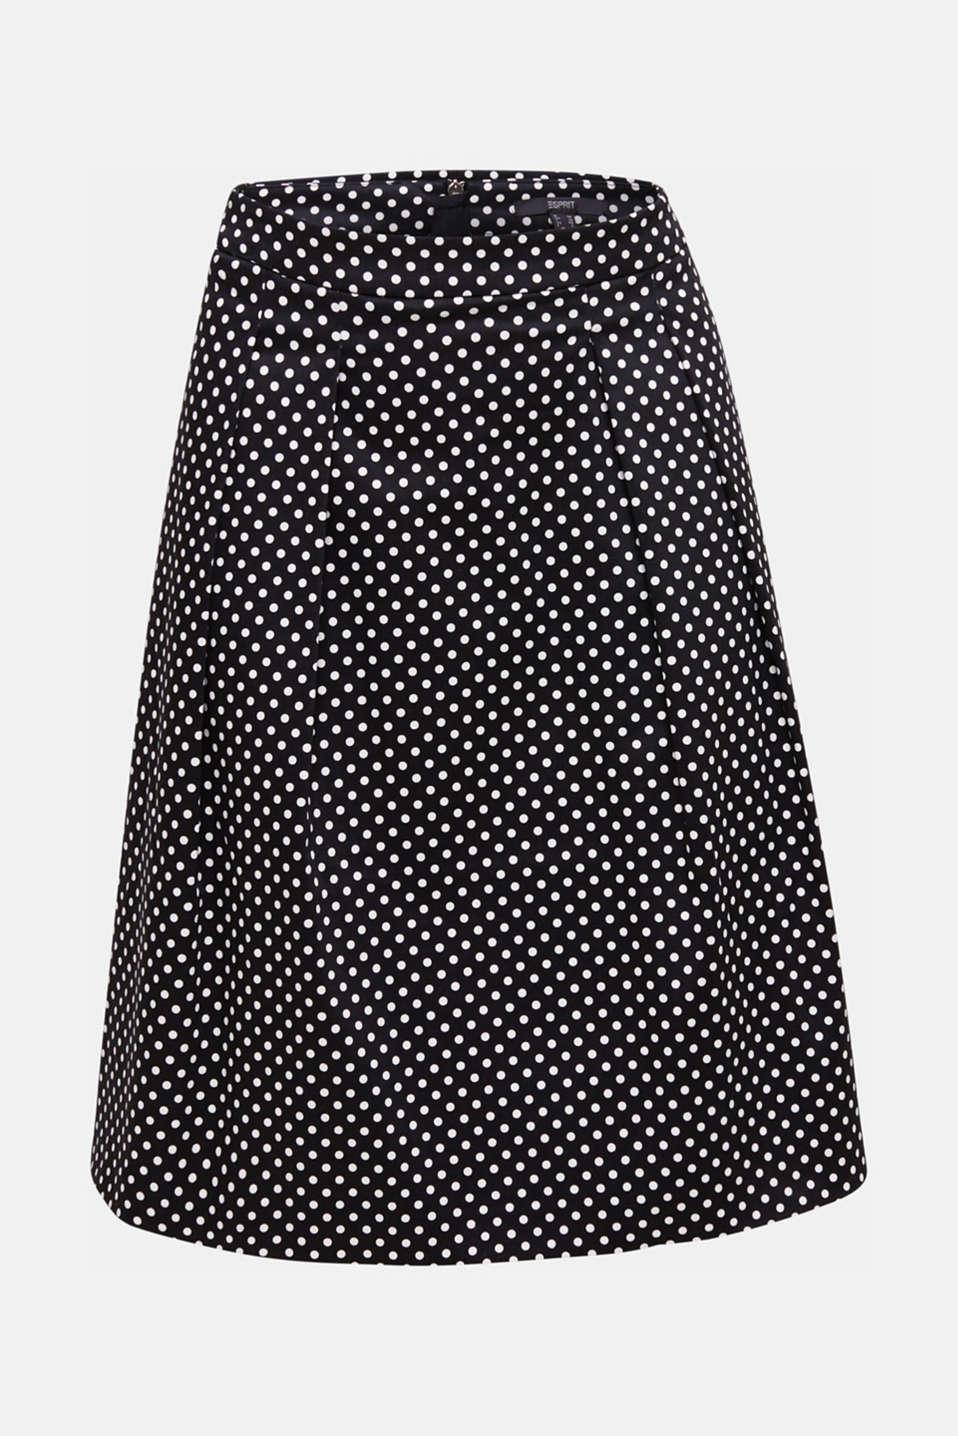 Satined polka dot skirt with stretch, BLACK 3, detail image number 5